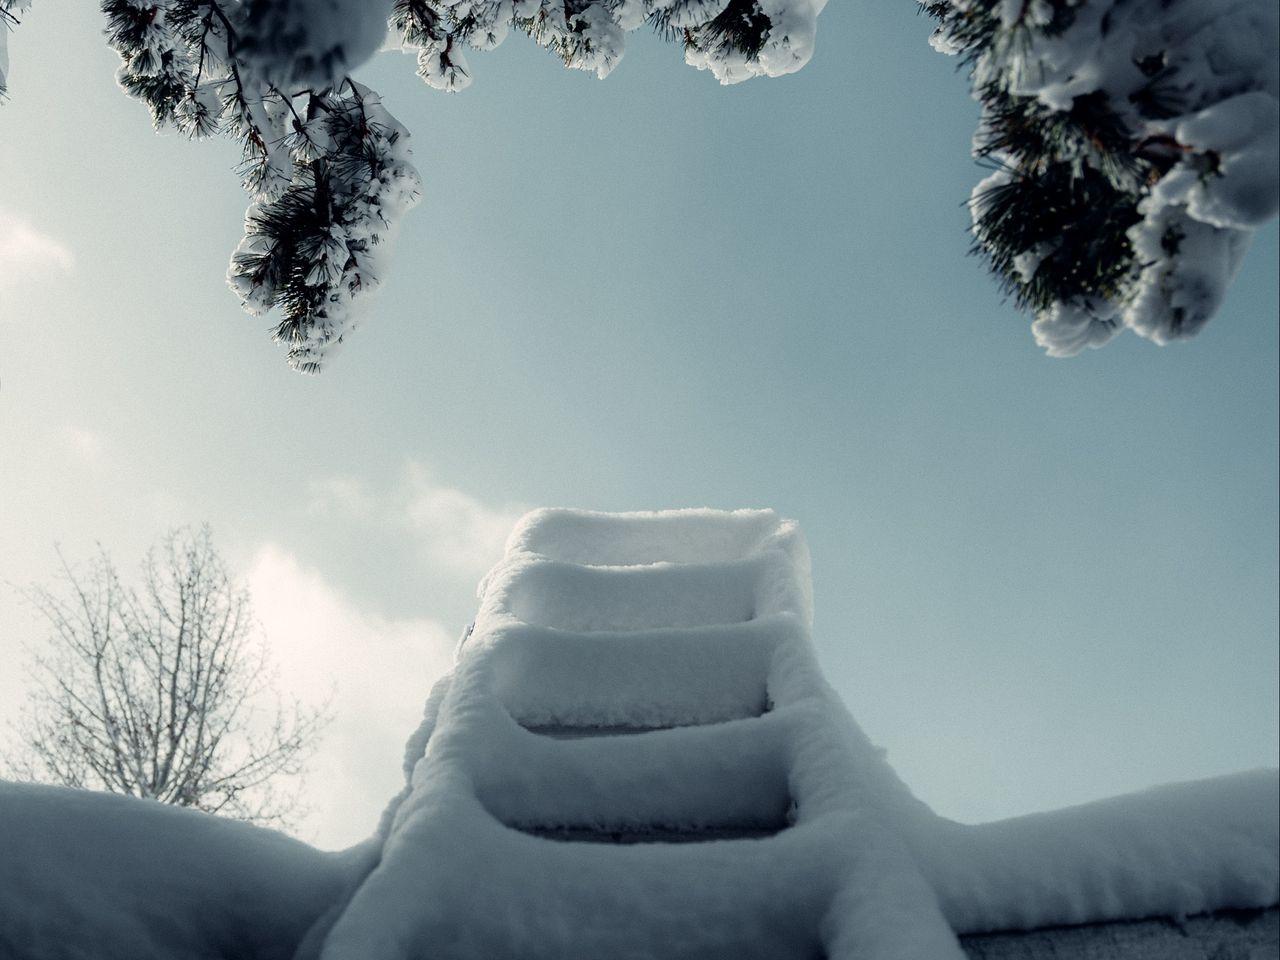 1280x960 Wallpaper ladder, snow, branch, winter